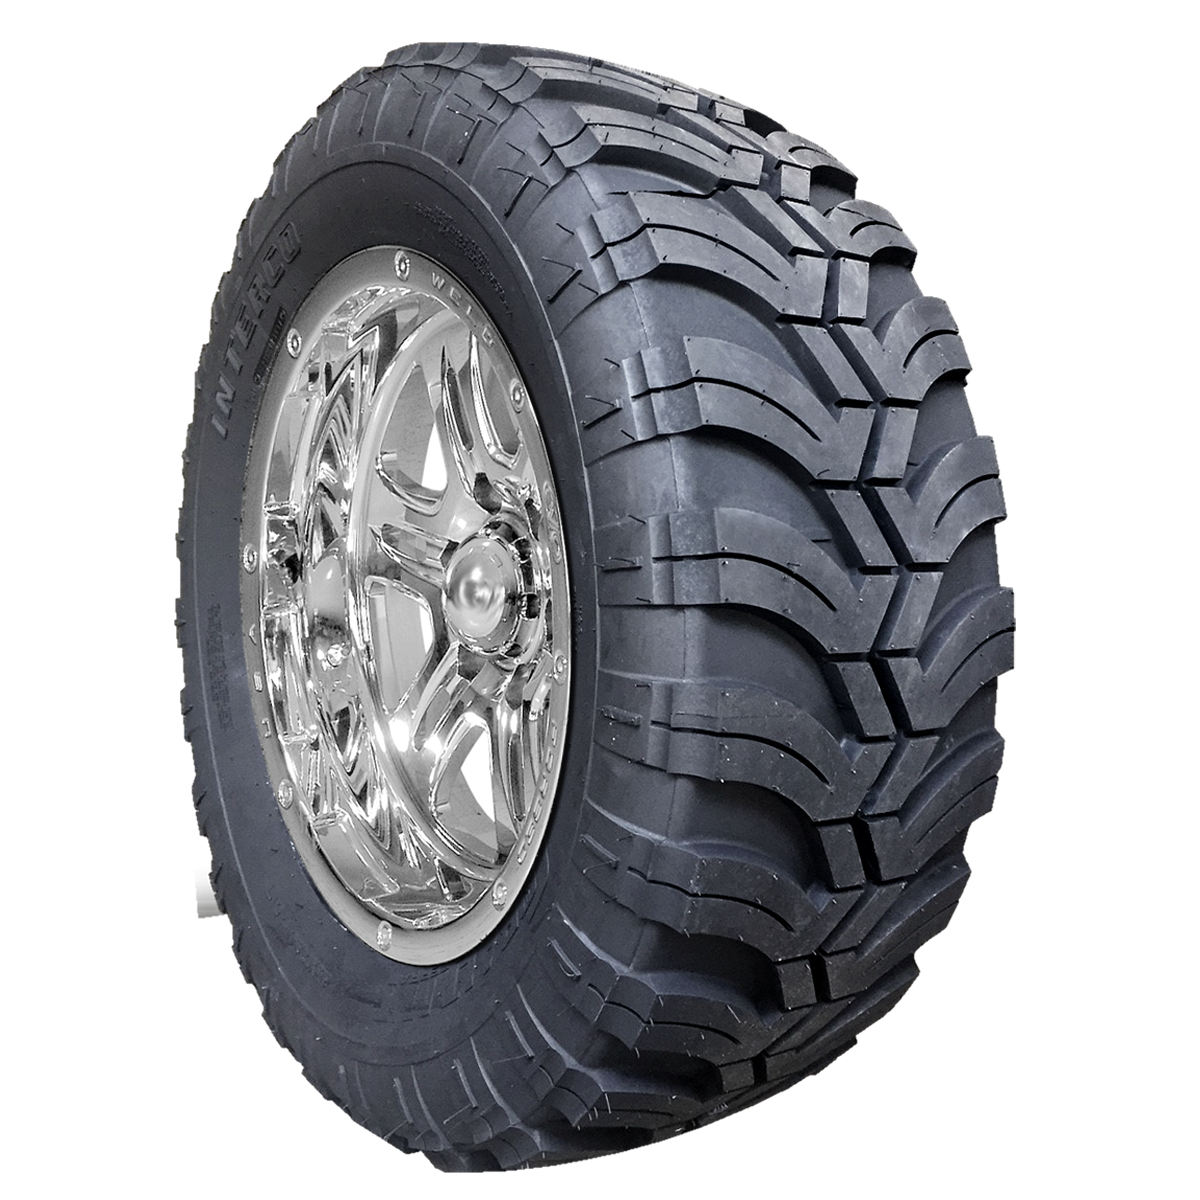 Maxxis Zilla Atv Tires  Pure Offroad